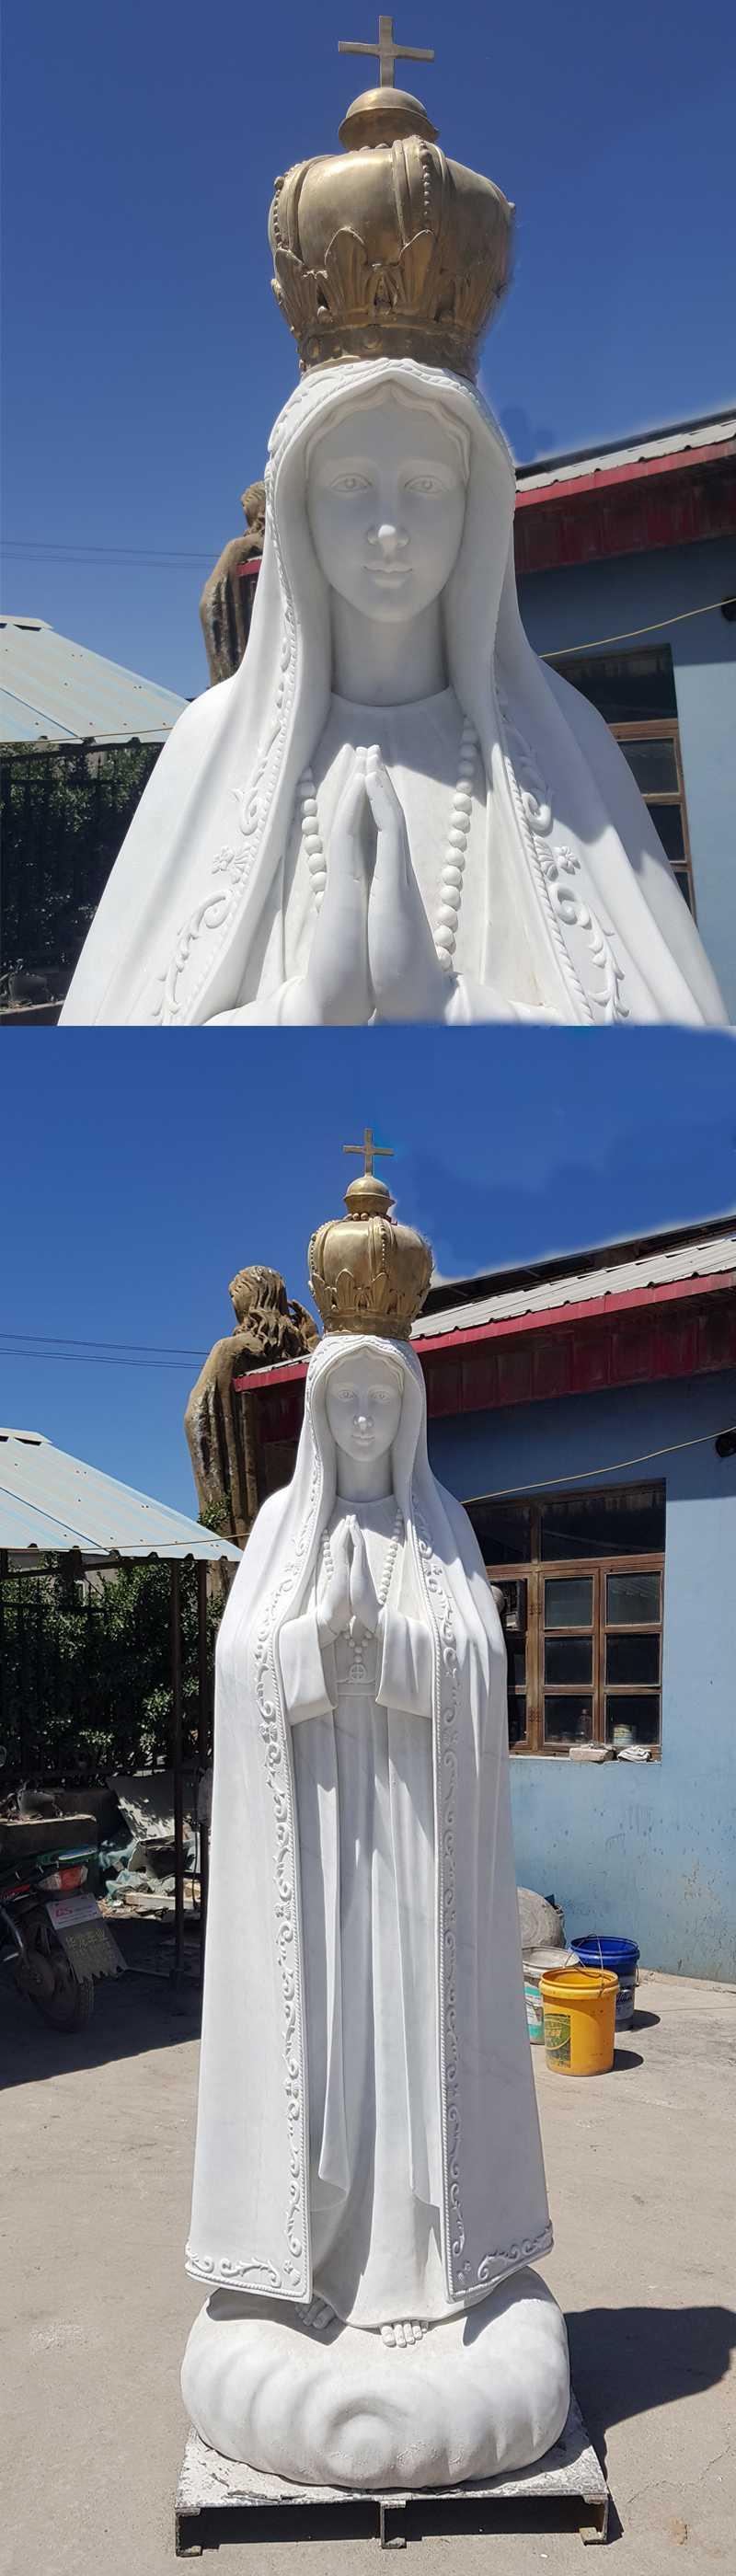 our lady of fatima pilgrim statue for sale